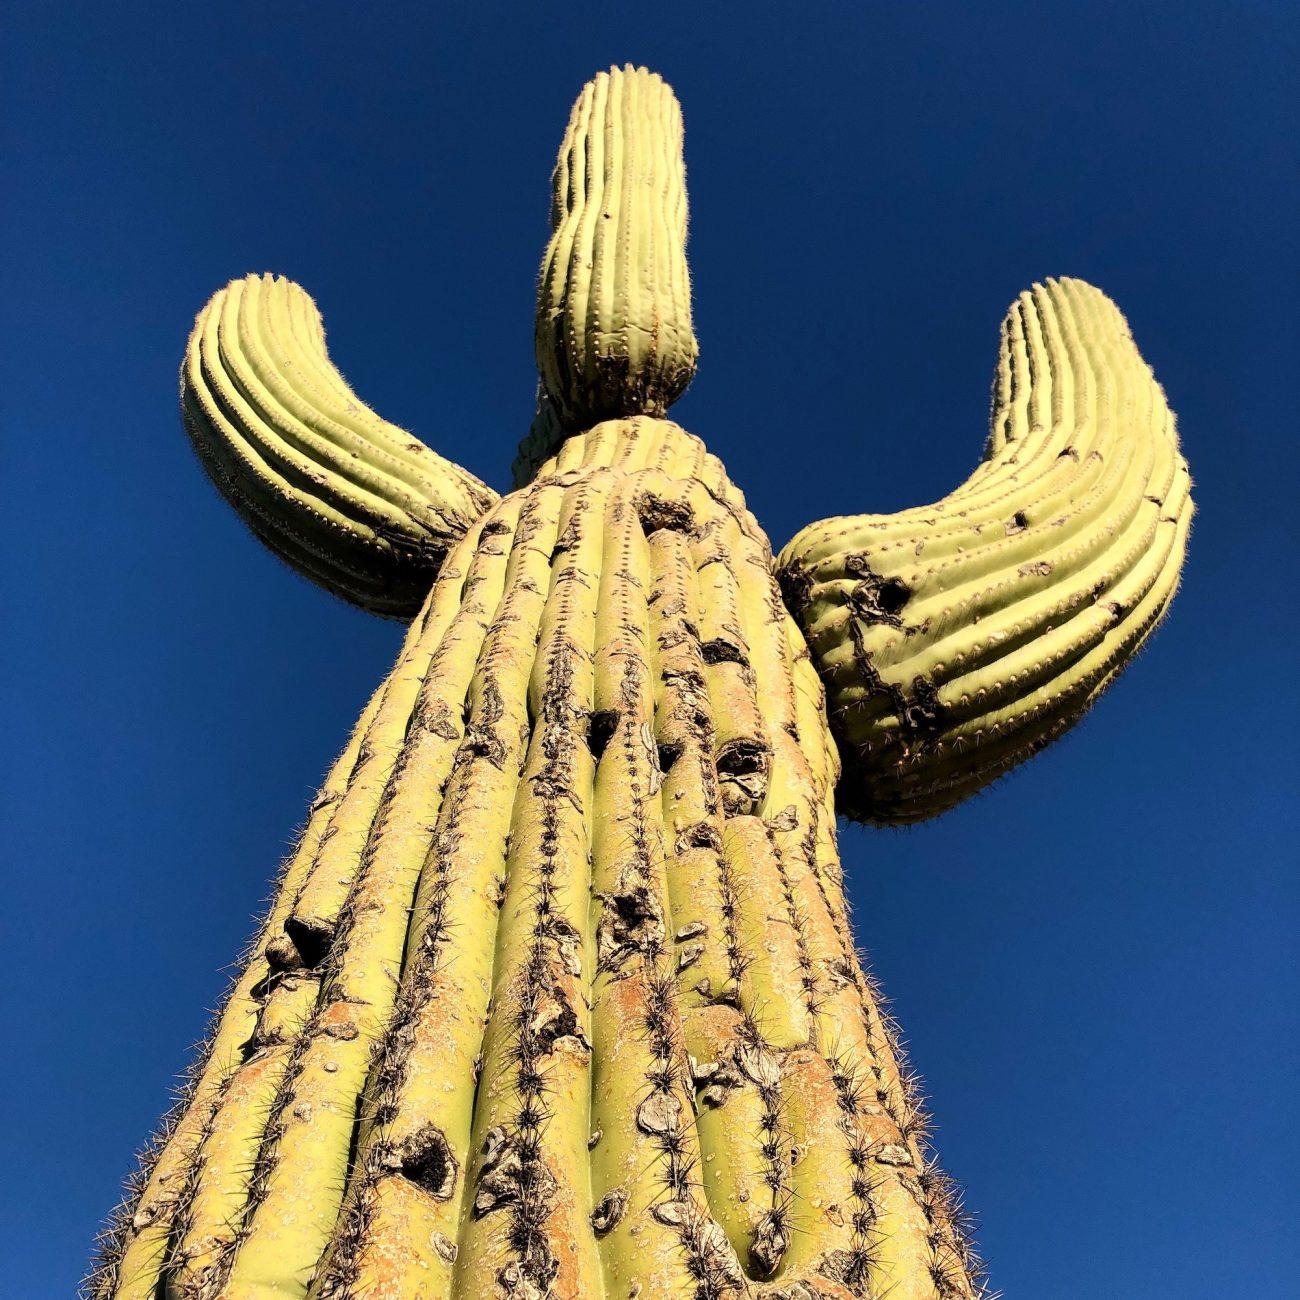 Giant Saguaro at Catalina State Park